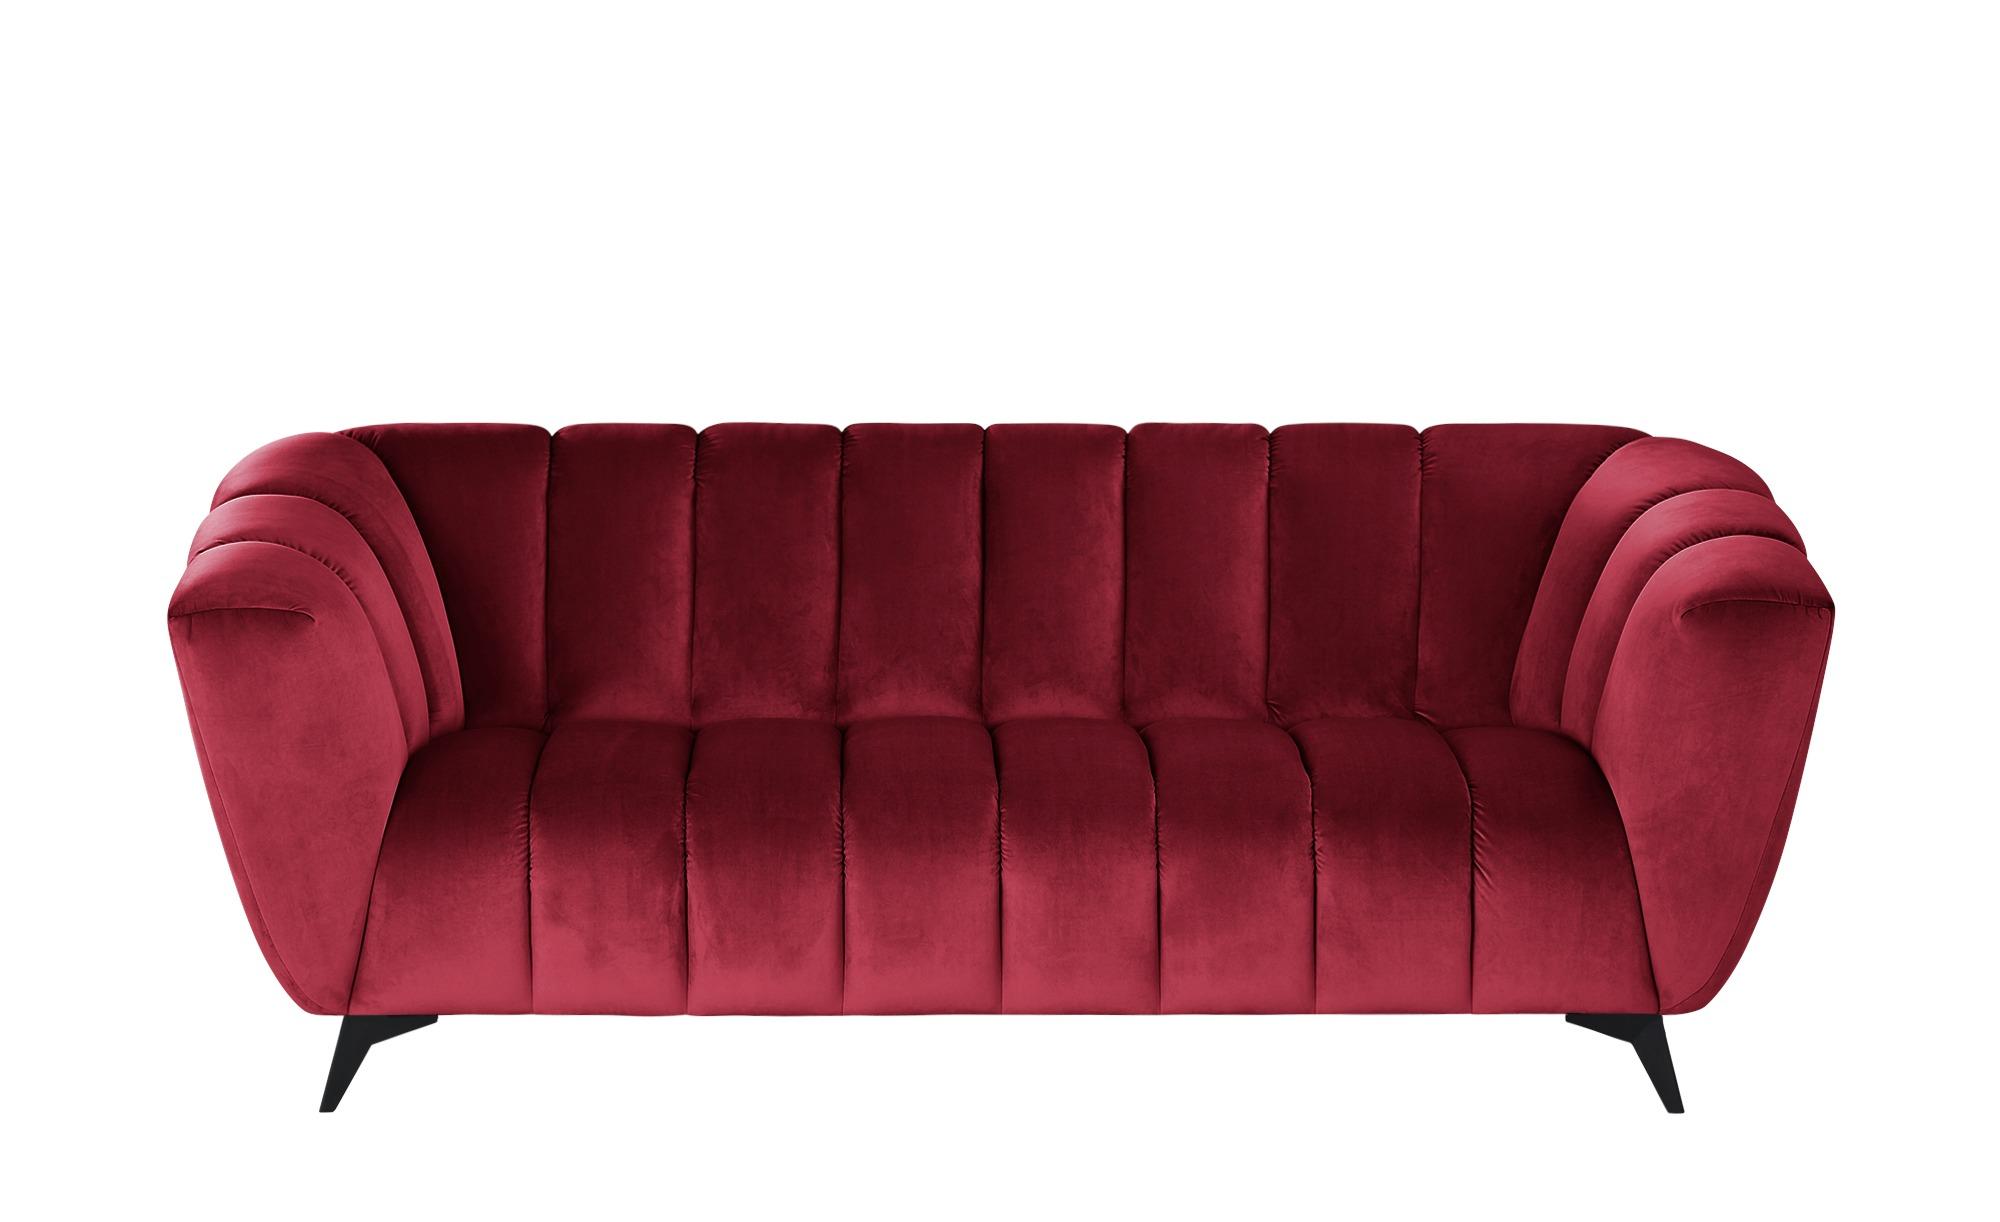 Sofa  Samantha ¦ rot ¦ Maße (cm): B: 220 H: 86 T: 100 Polstermöbel > Sofas > 3-Sitzer - Höffner